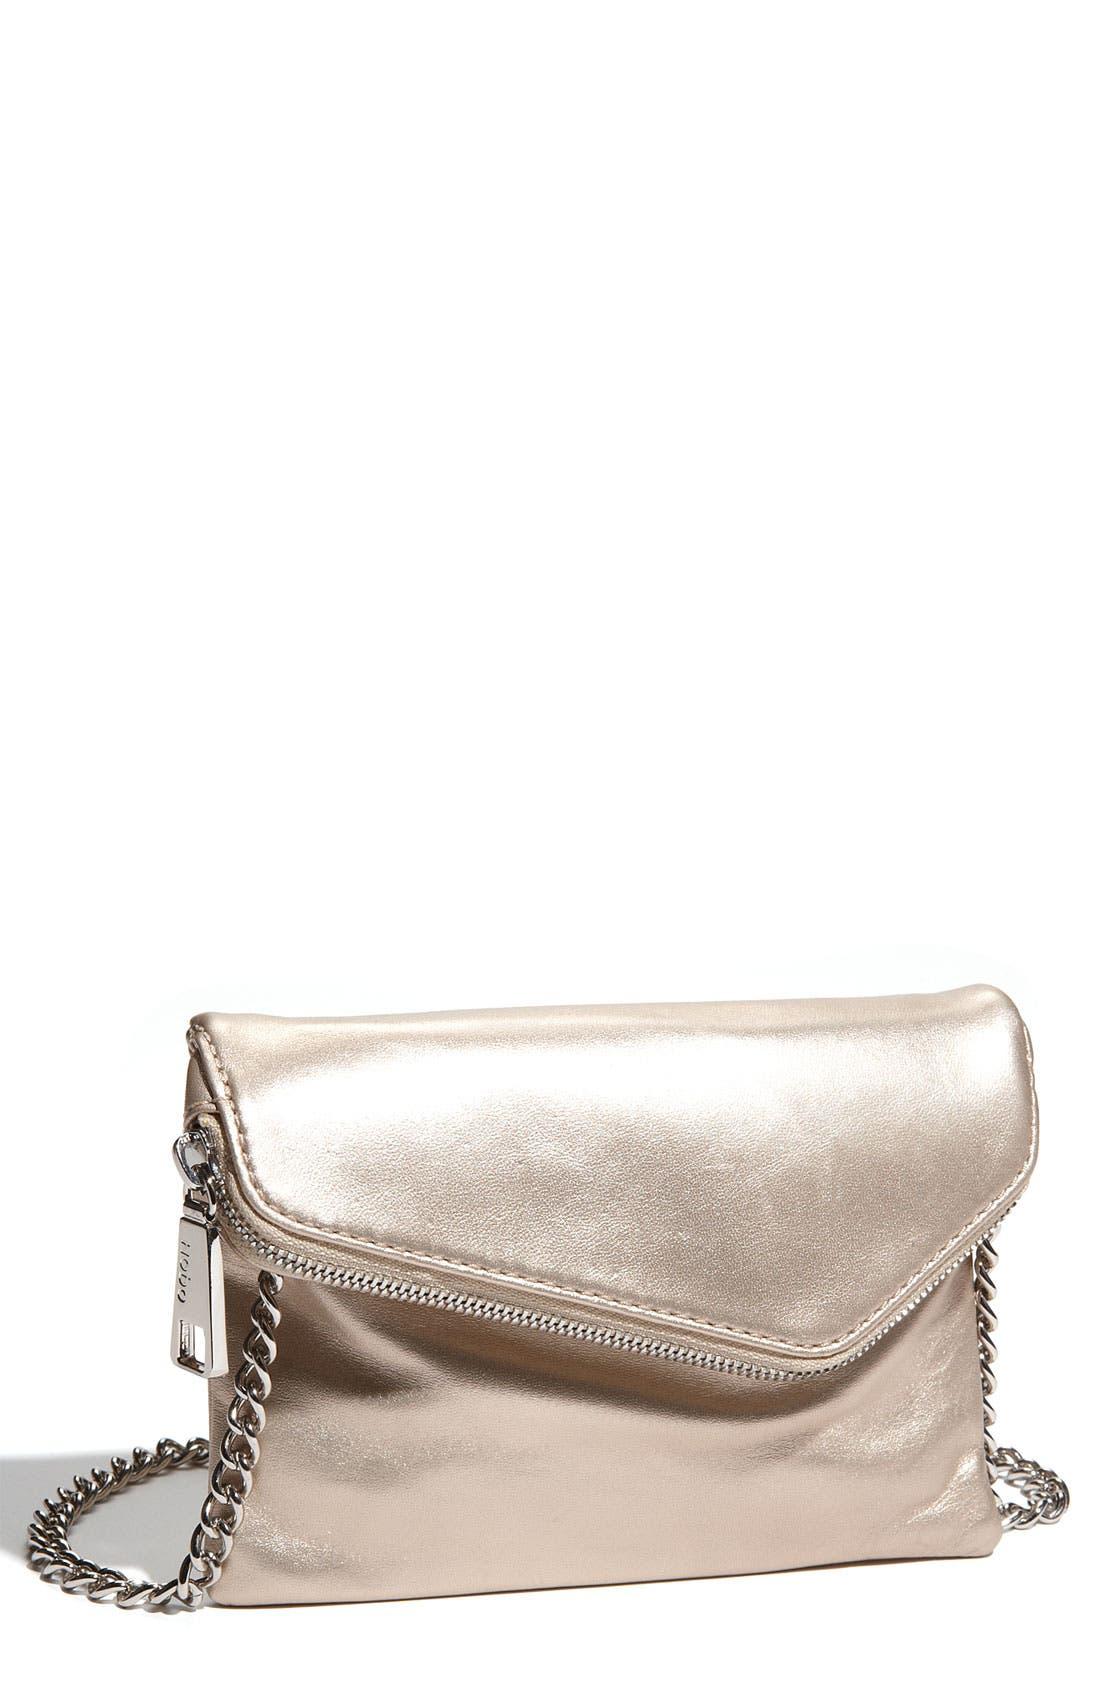 Main Image - Hobo 'Daria' Metallic Leather Crossbody Bag